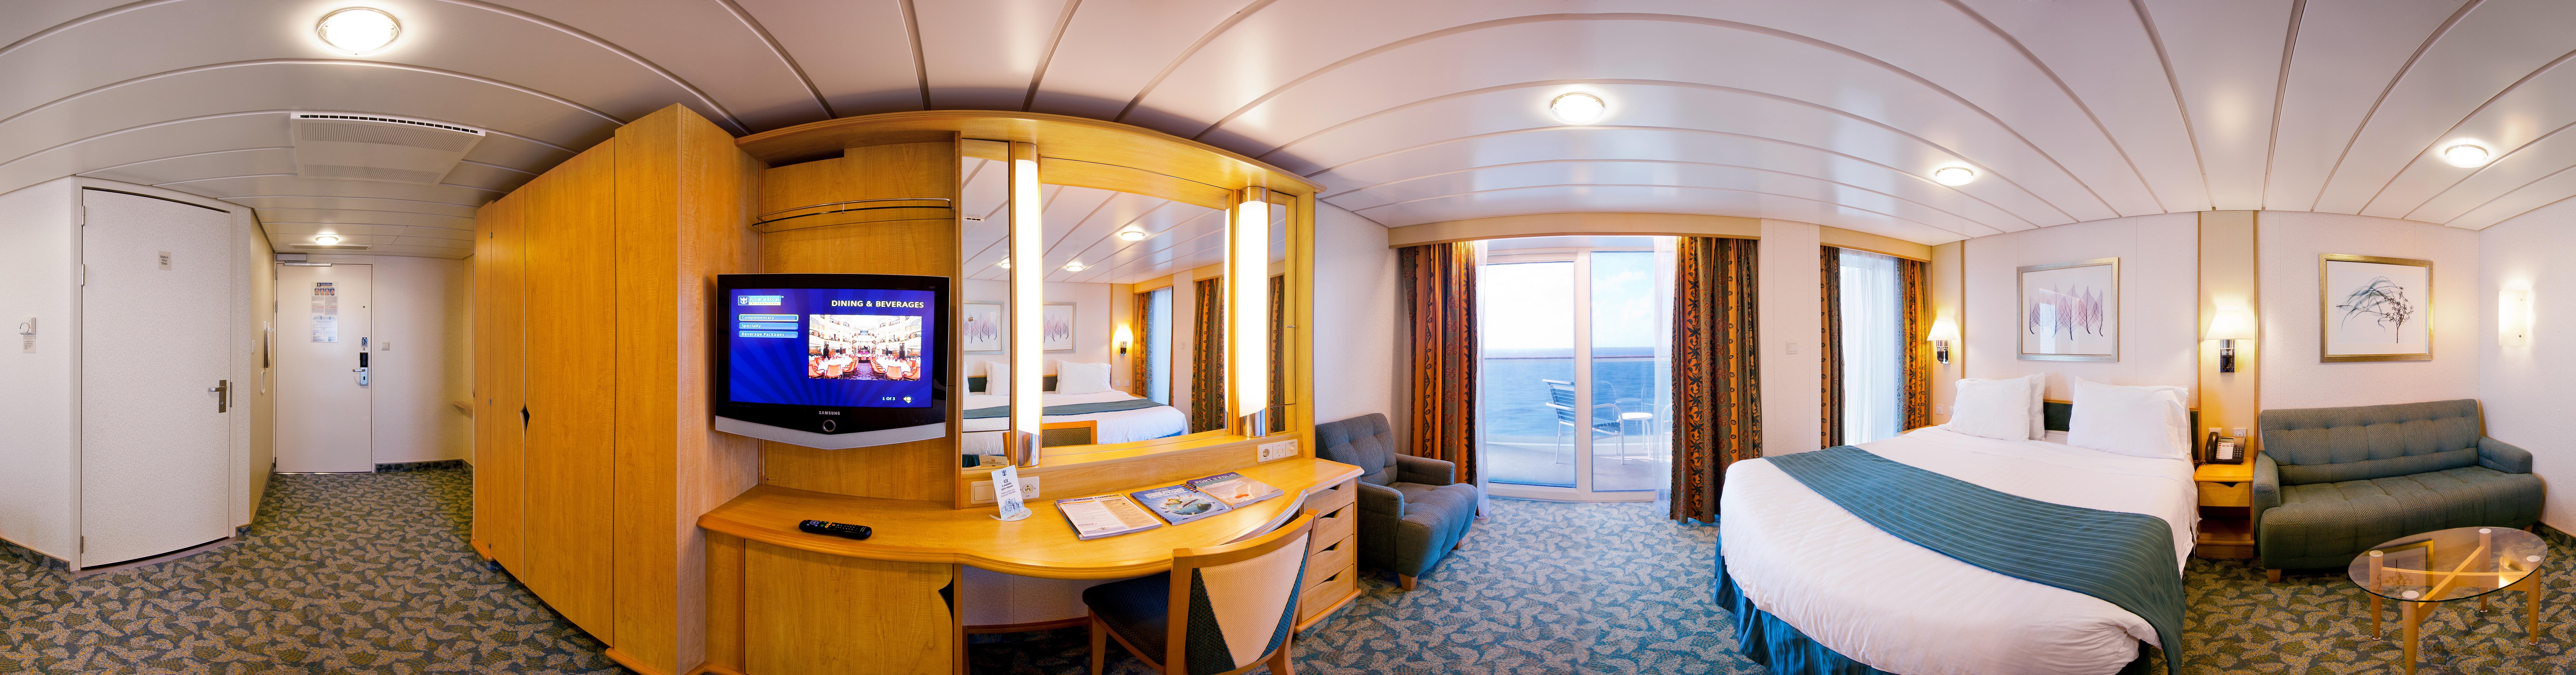 Royal Caribbean International Liberty of the seas Accommodation RCI_LB-AccBalcony_Pano_AX_.jpeg